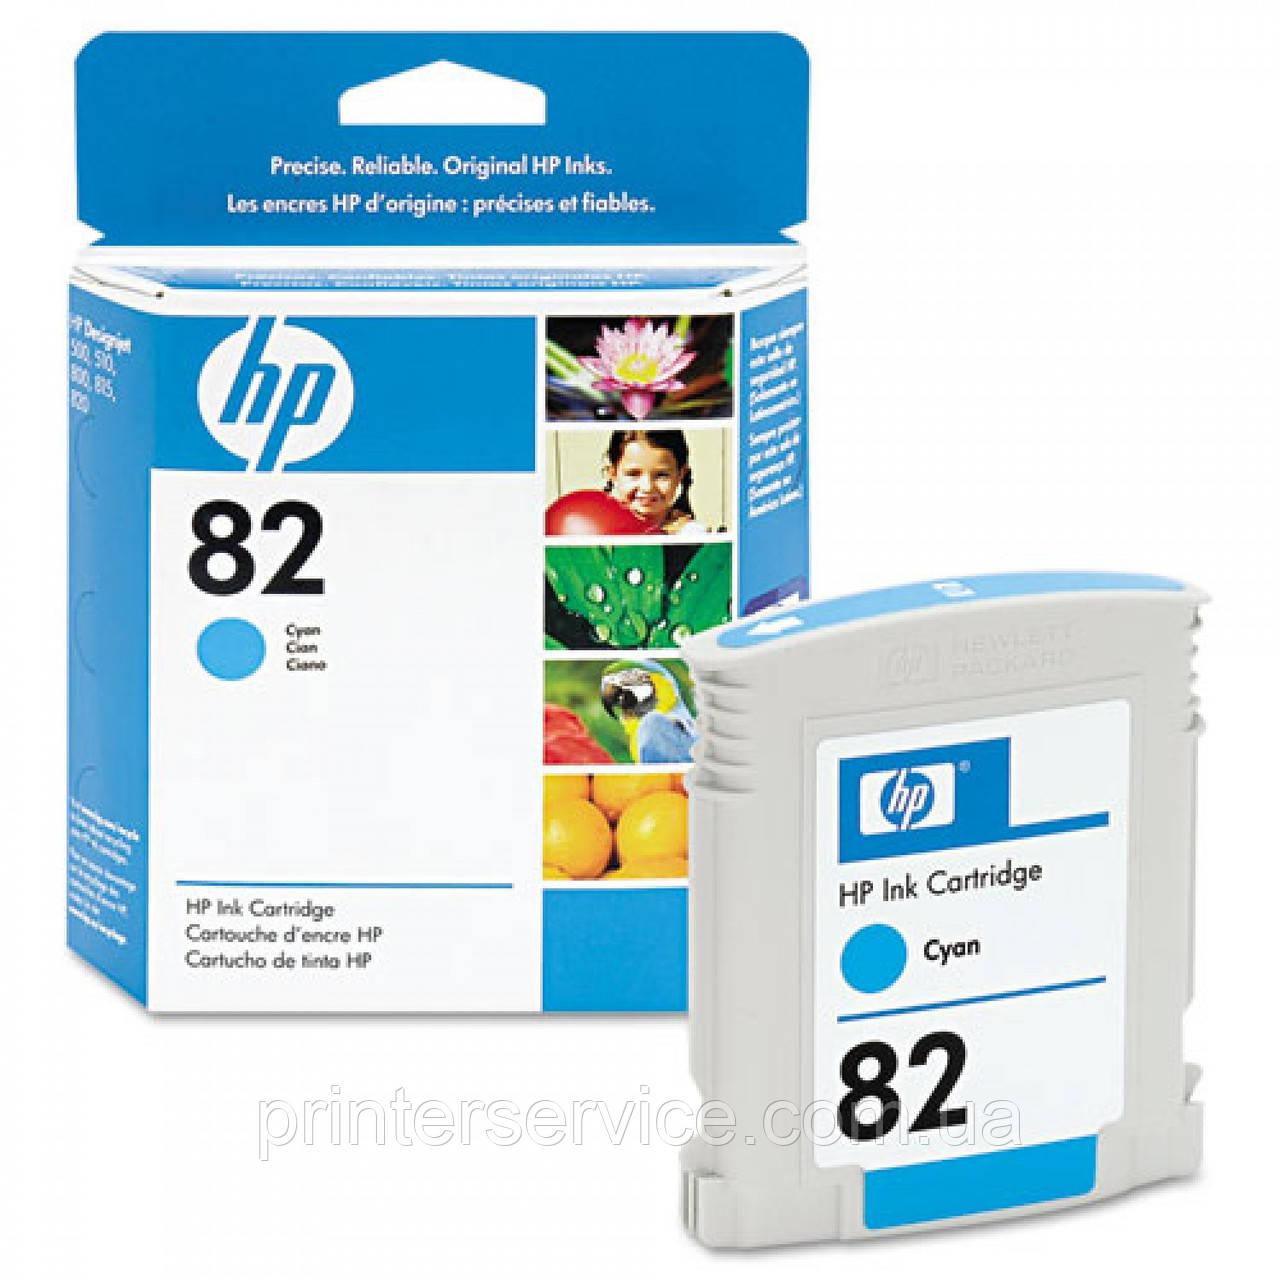 Картридж HP 82 для плоттера HP Designjet 500/800, голубой, 69 мл (C4911A)